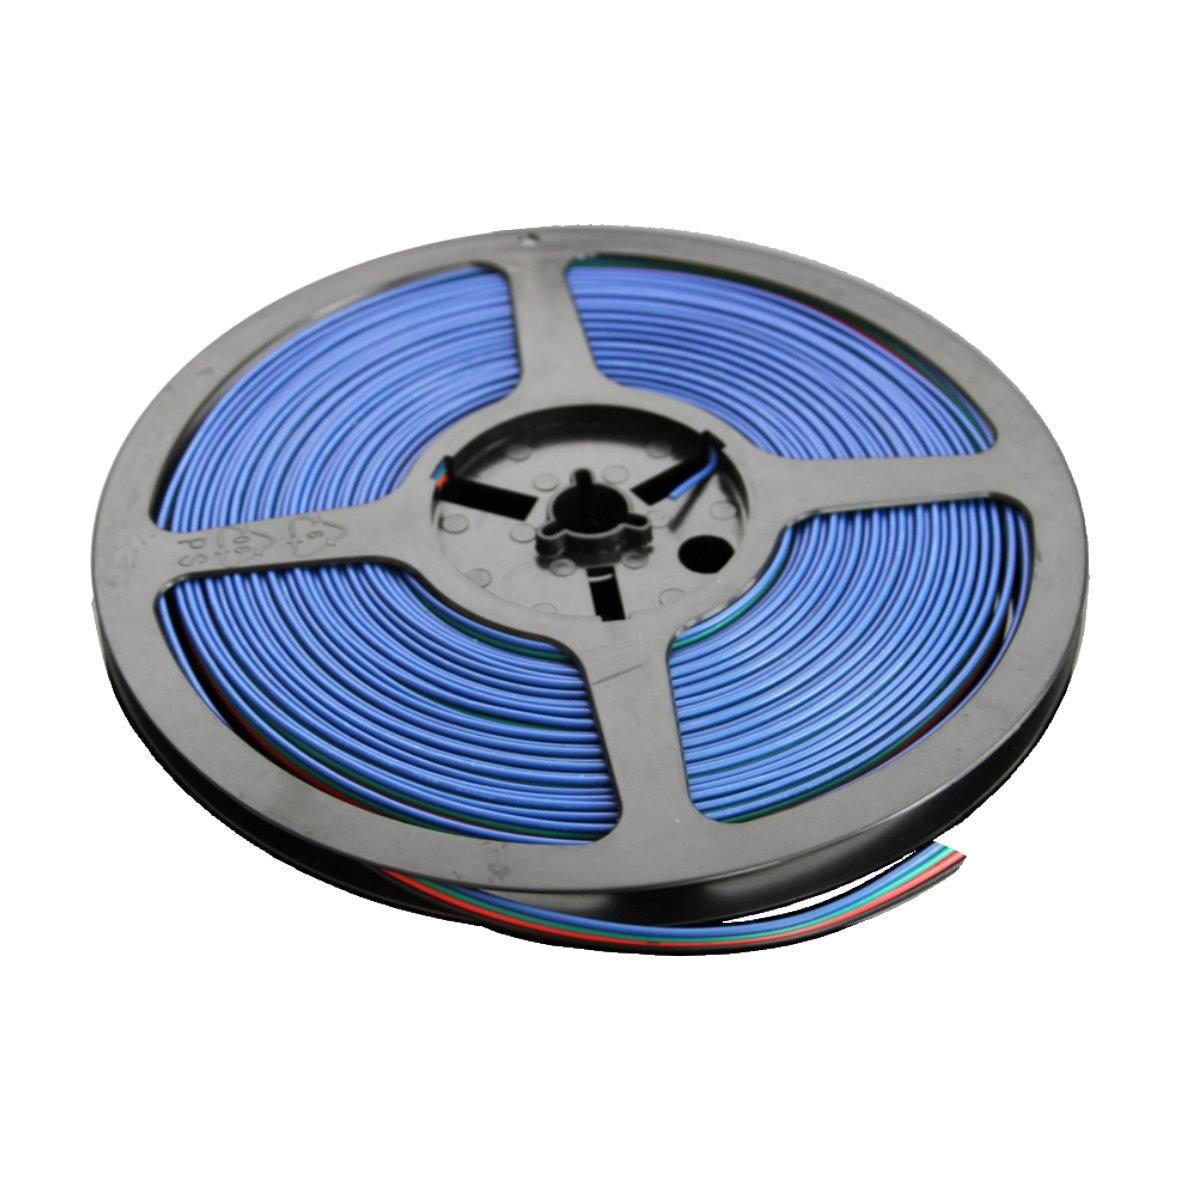 led lichtband strip adapter verbindungskabel kabel pin stecker clip ecke eck rgb ebay. Black Bedroom Furniture Sets. Home Design Ideas